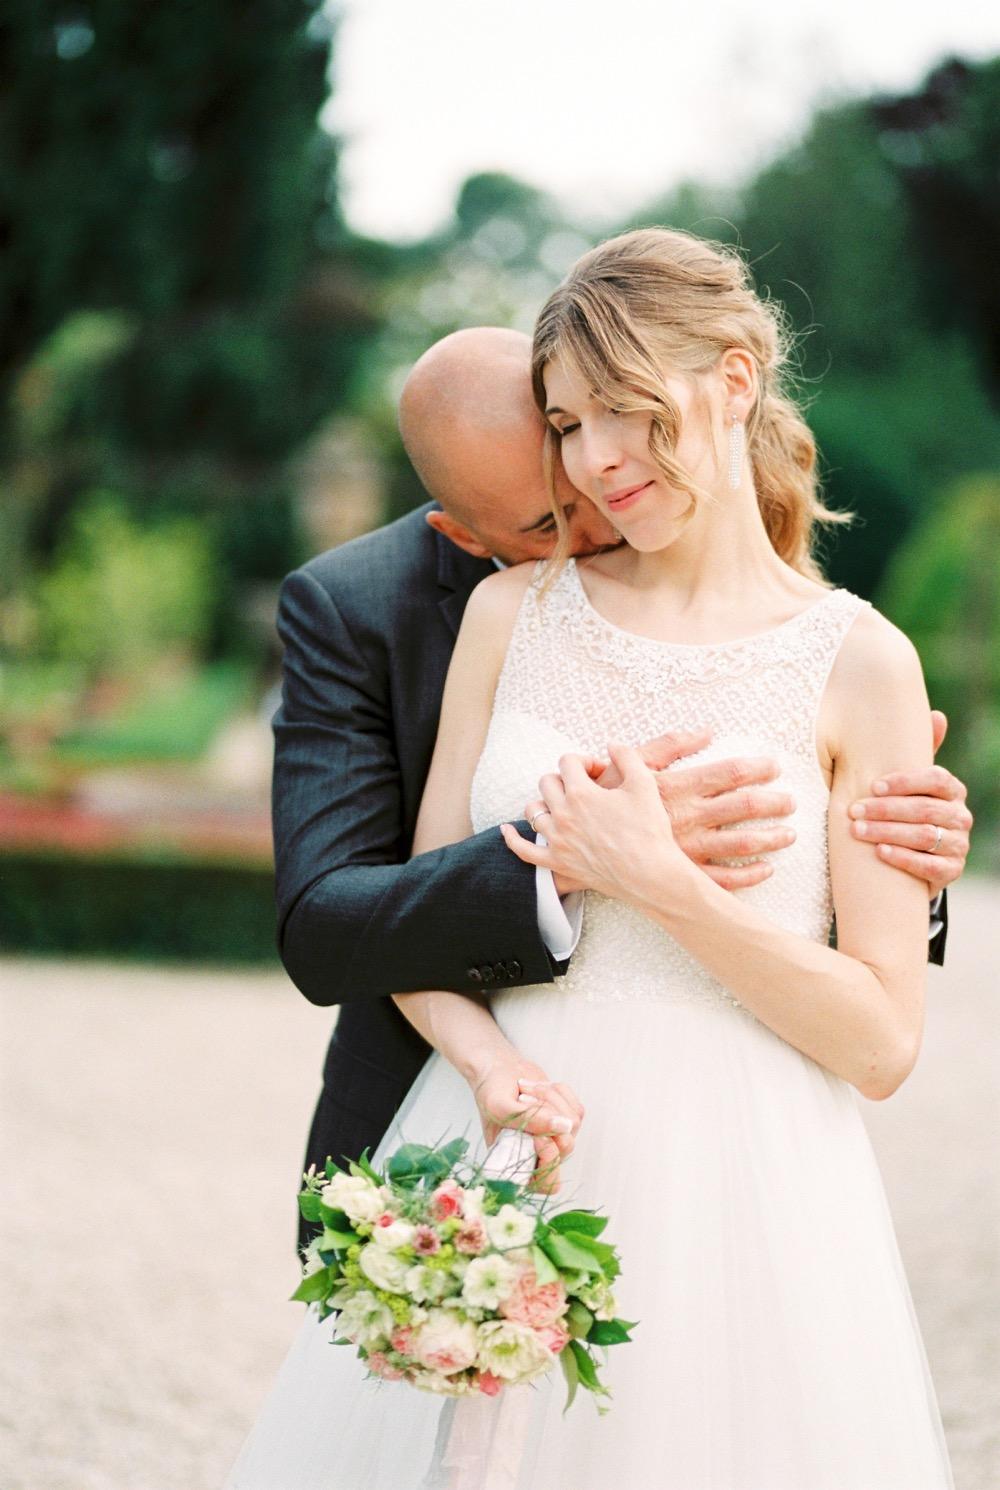 darya kamalova thecablookfotolab fine art film fhotographer in italy destination wedding como lake villa regina teodolinda villa pisani scalabrin-405